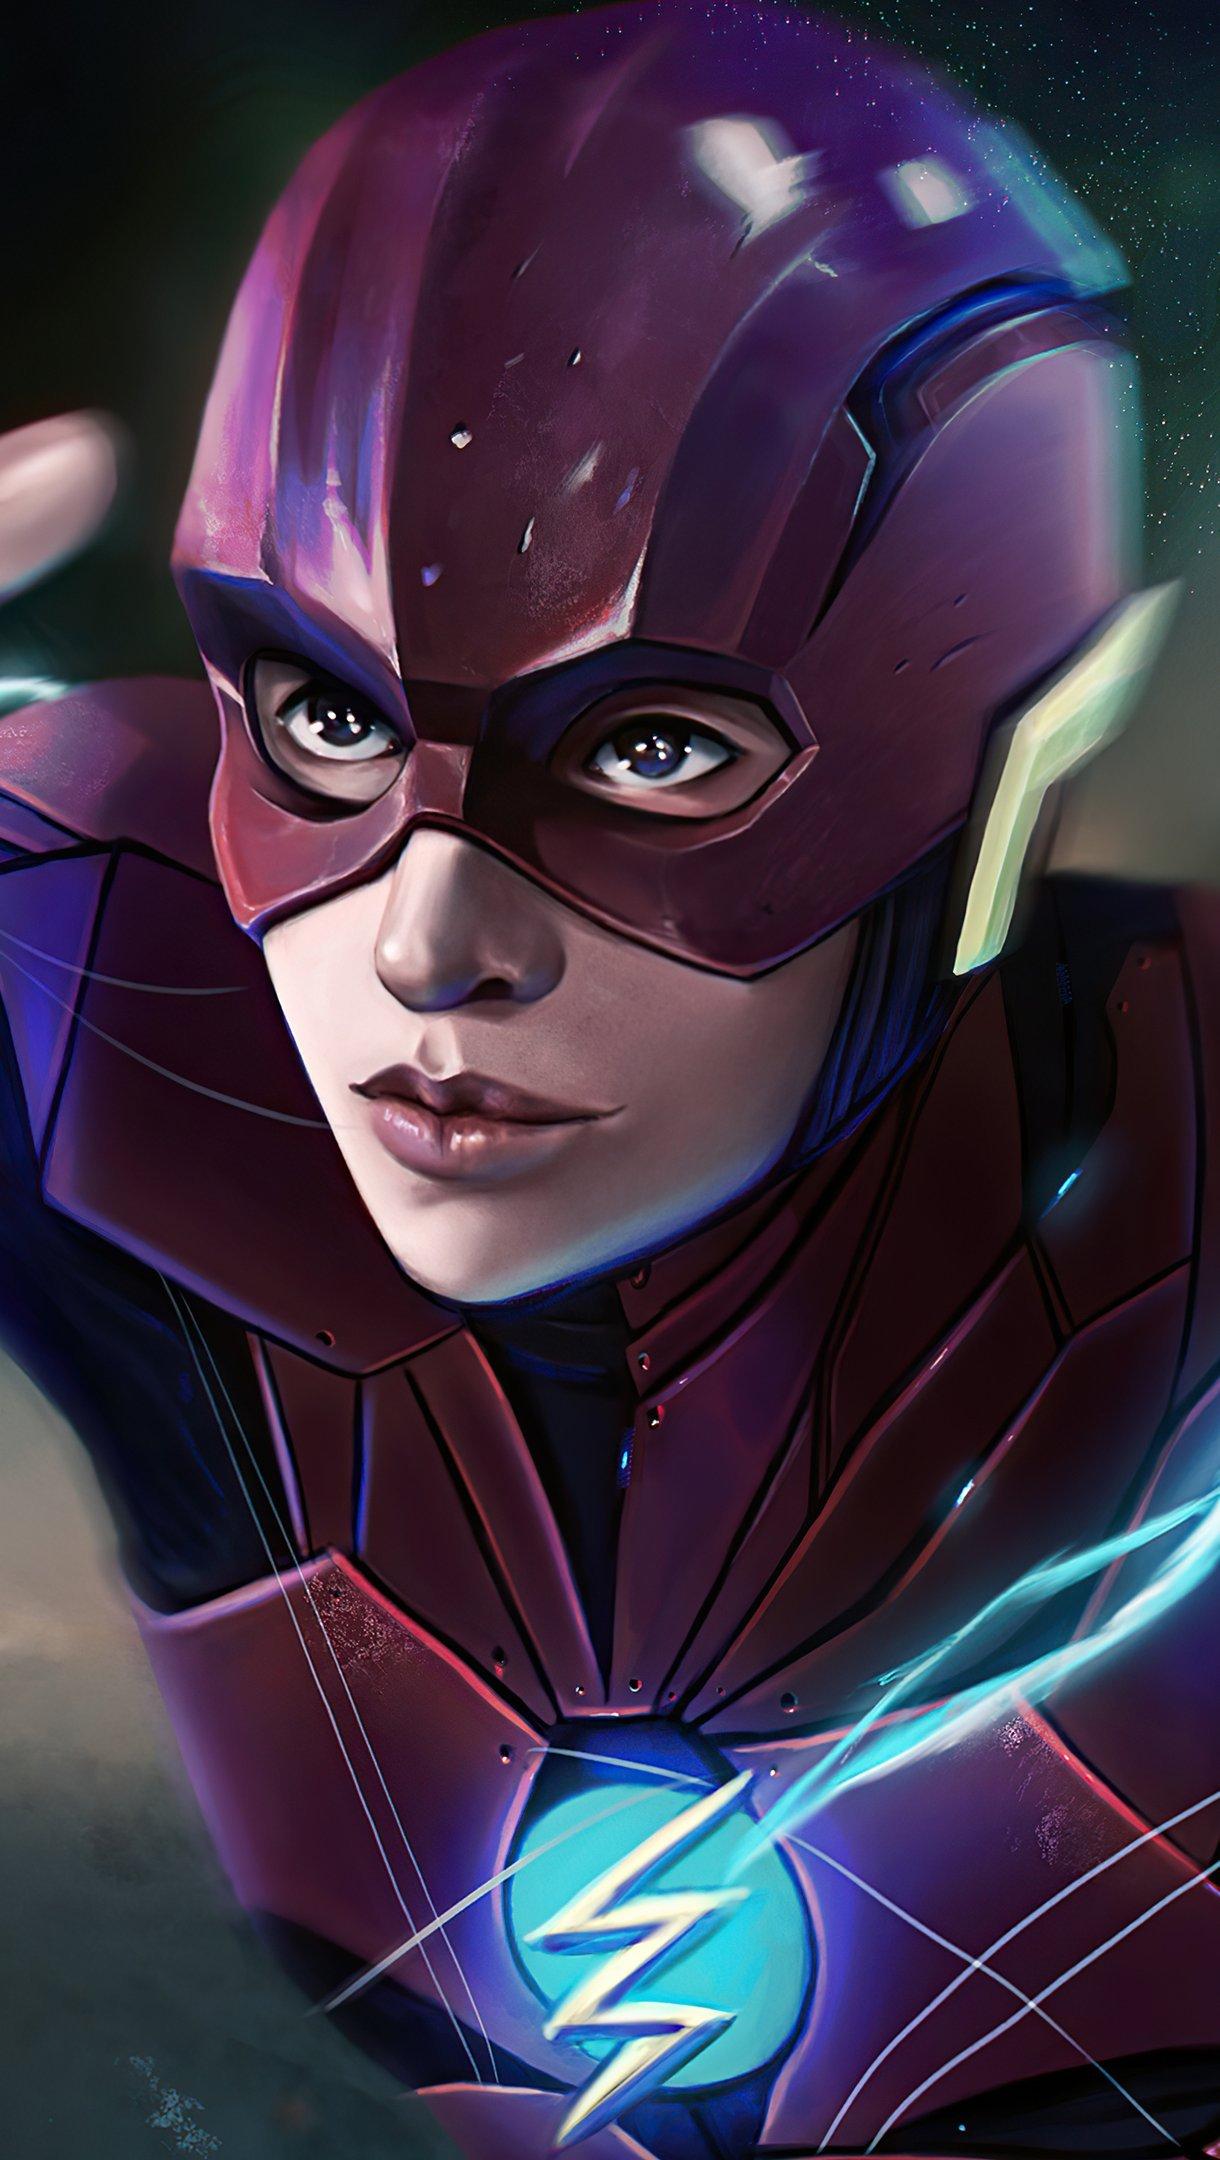 Wallpaper Flash Justice League Snydercut Fanart Vertical